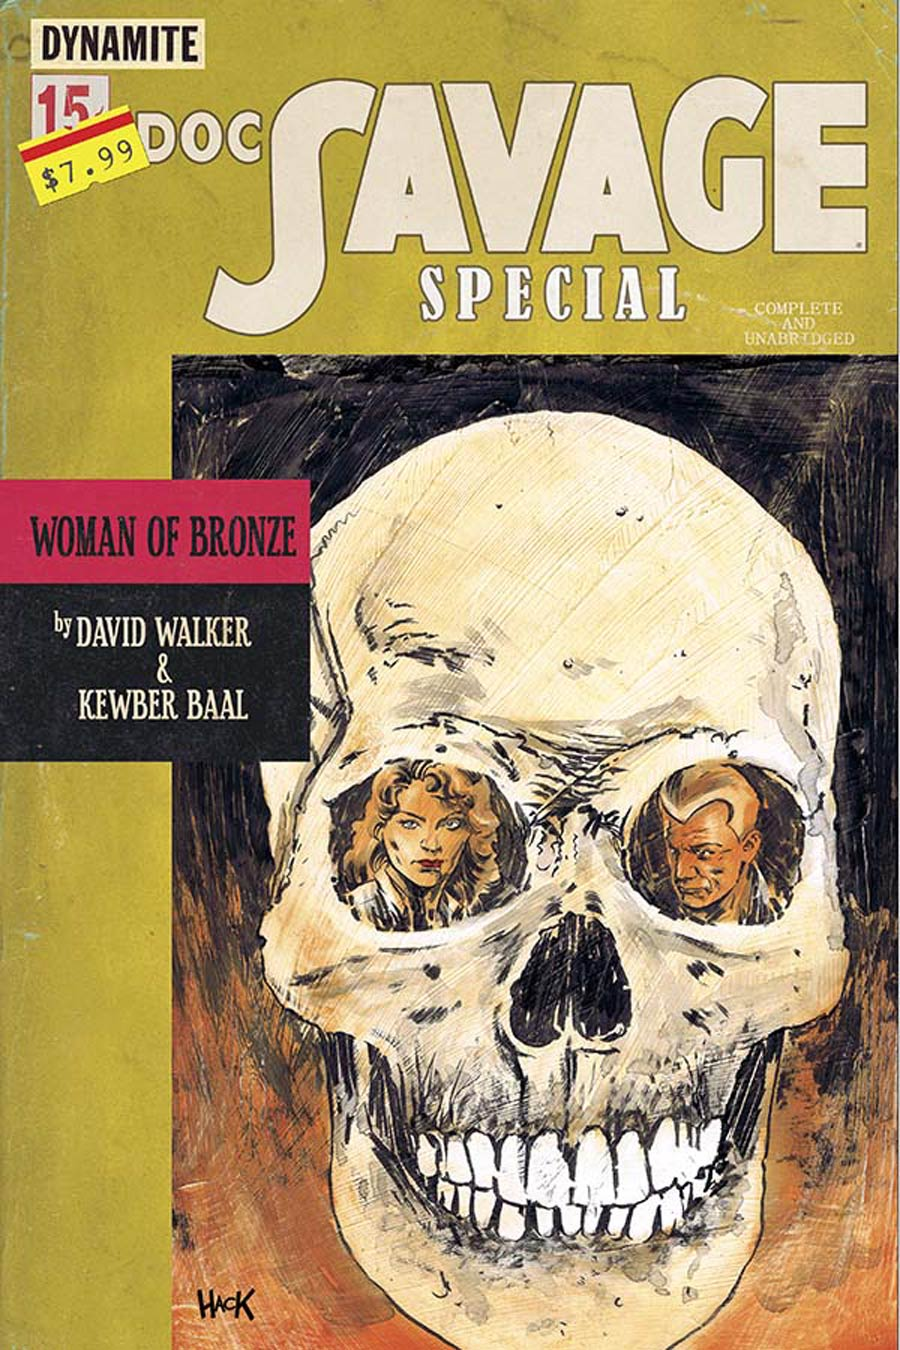 Doc Savage Vol 5 Special 2014